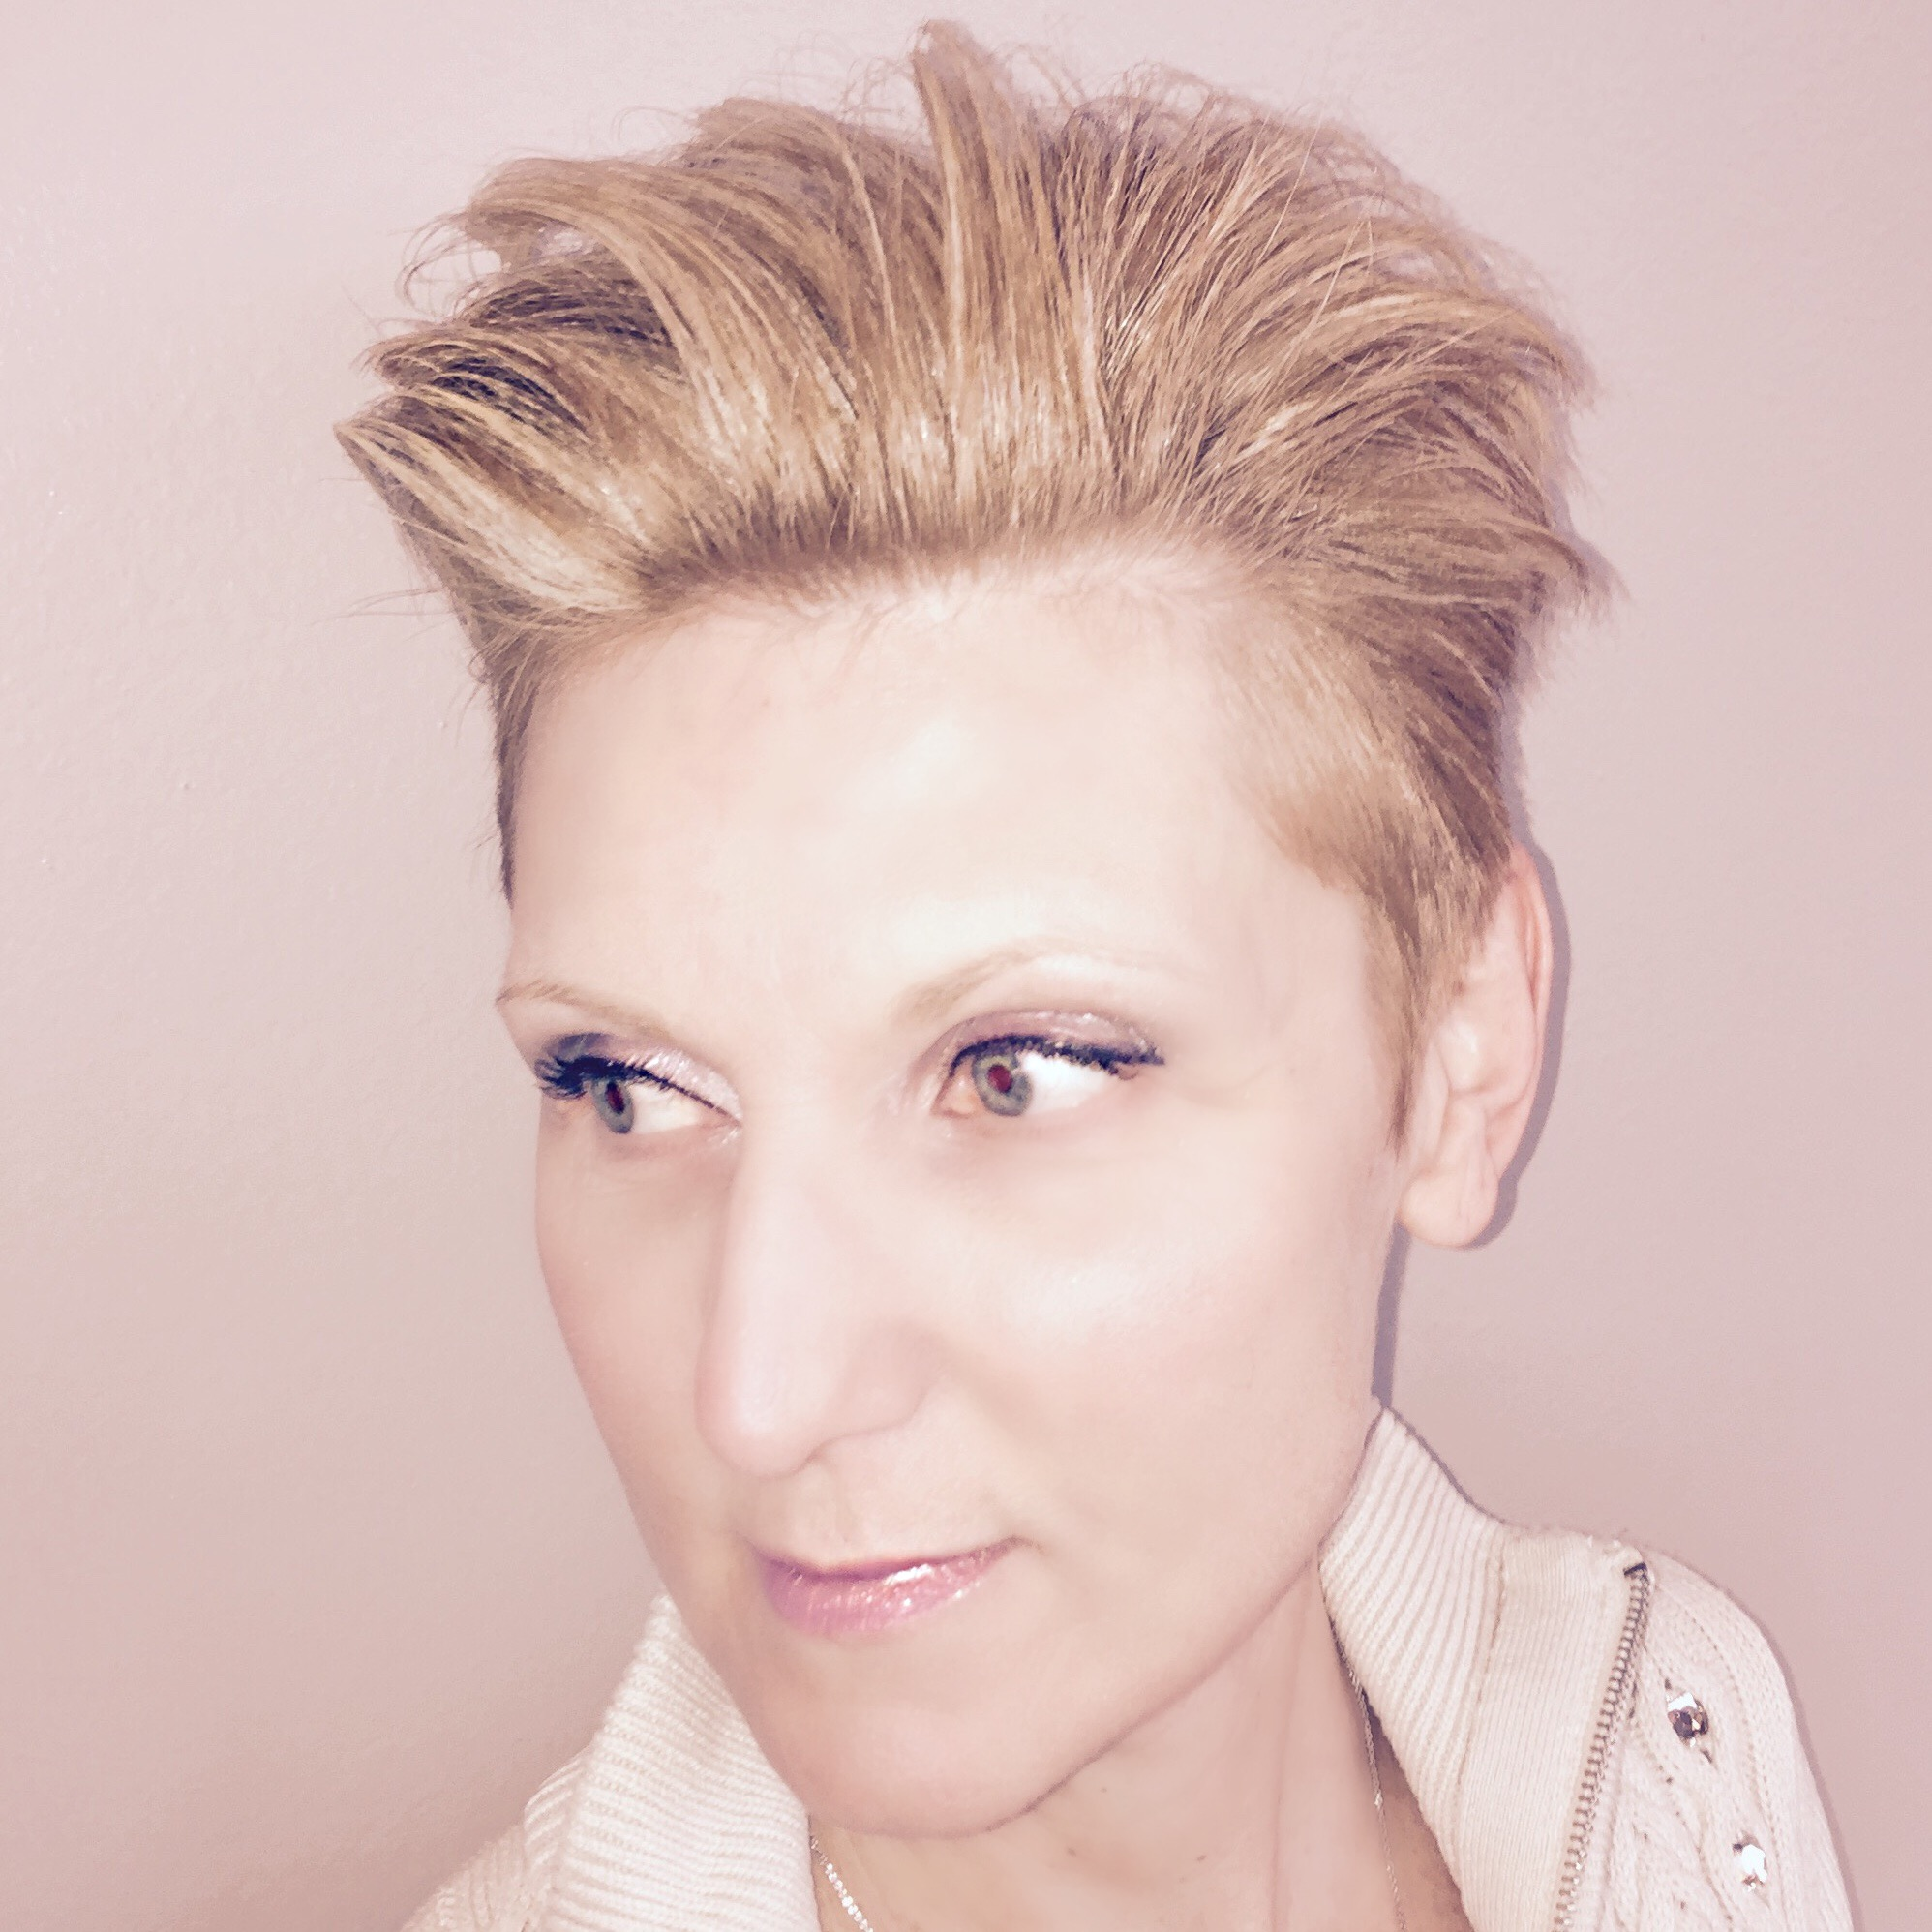 Haircut by Lynn Blanchard